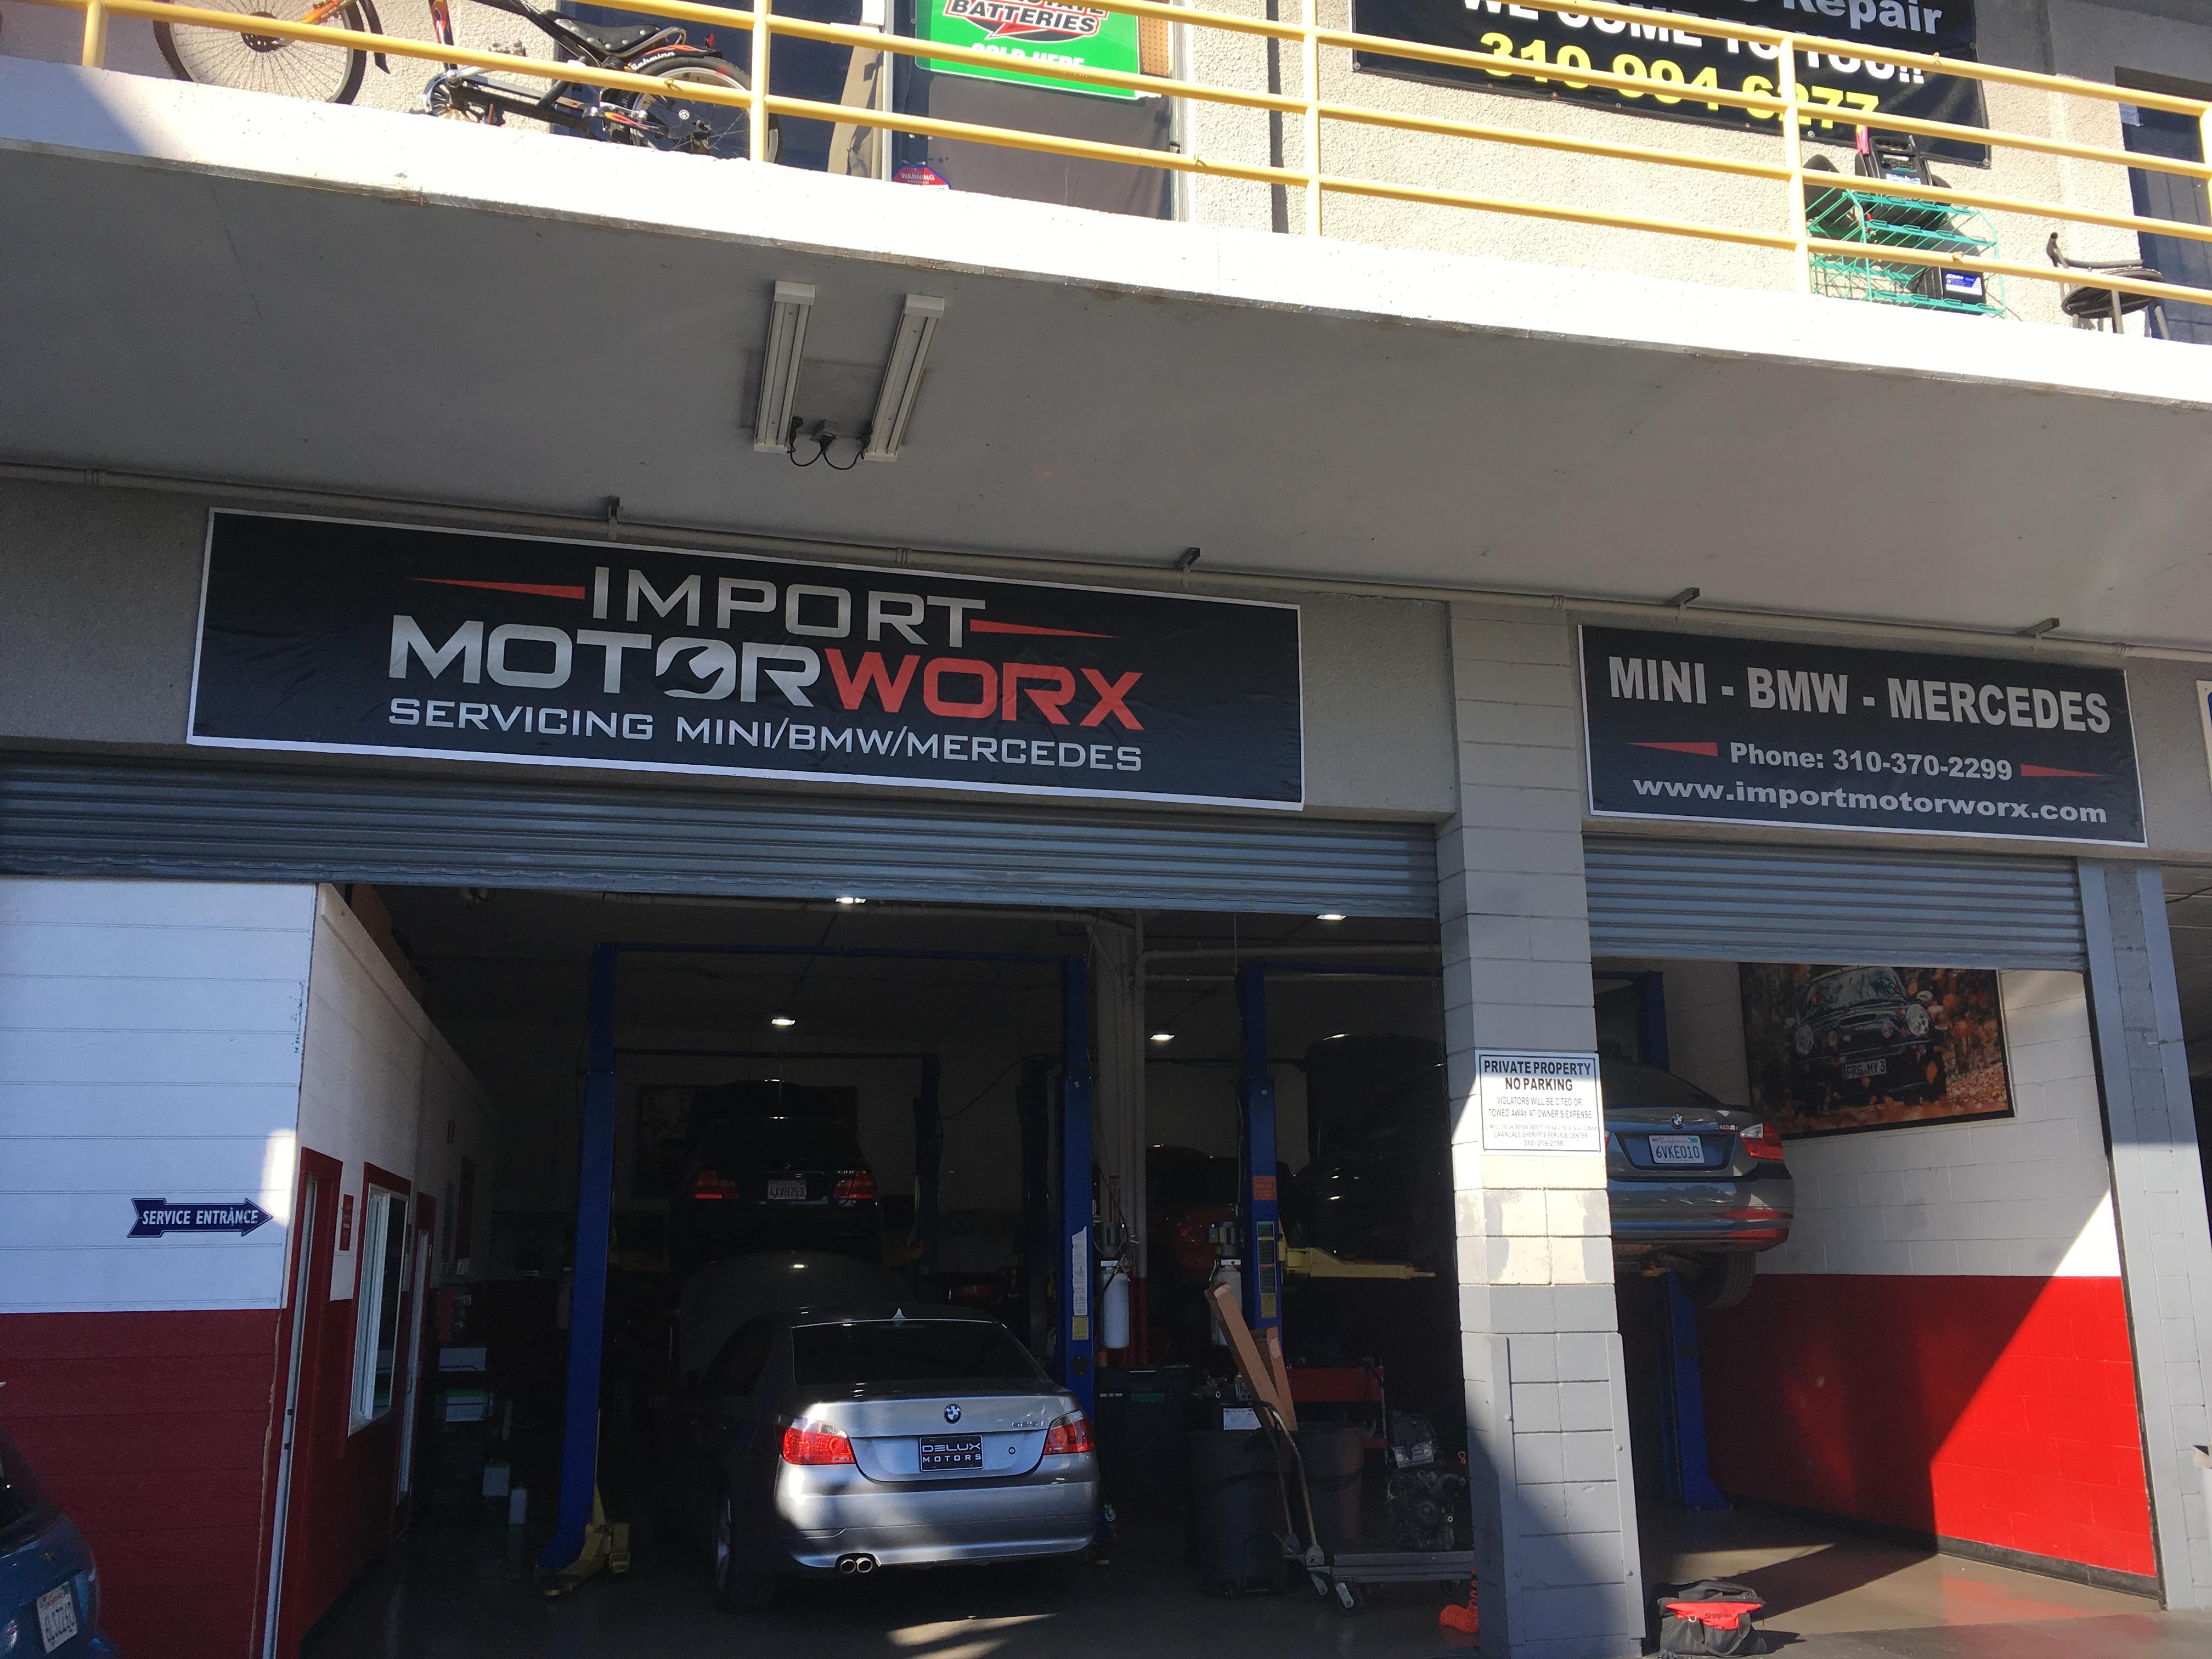 Cvt Transmission Repair Houston >> Import MotorWorx in Lawndale, CA | Whitepages